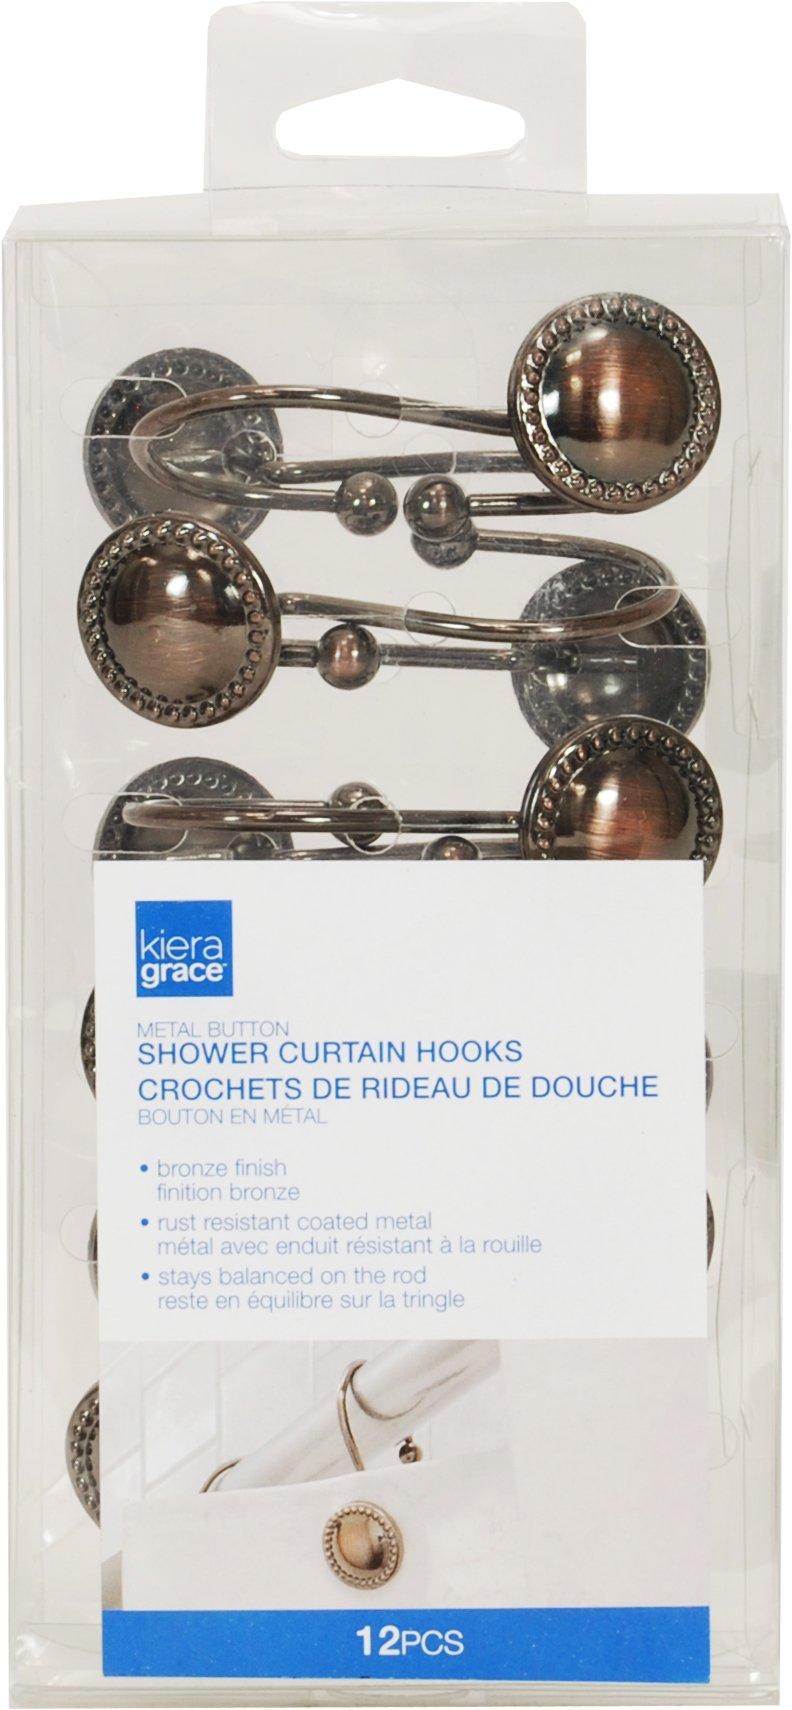 Kiera Grace Button Design Shower Curtain Hooks - Set of 12